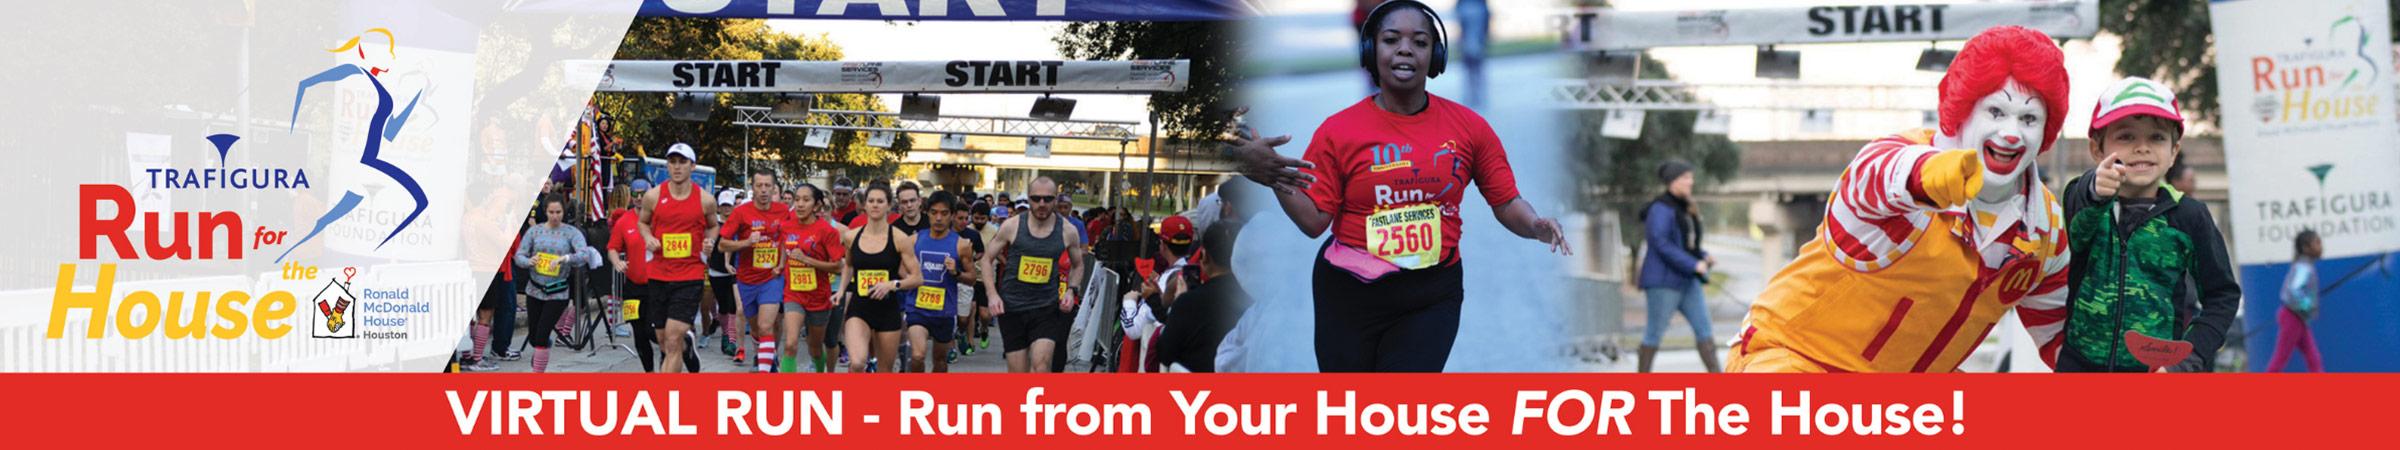 Trafigura Run for the House